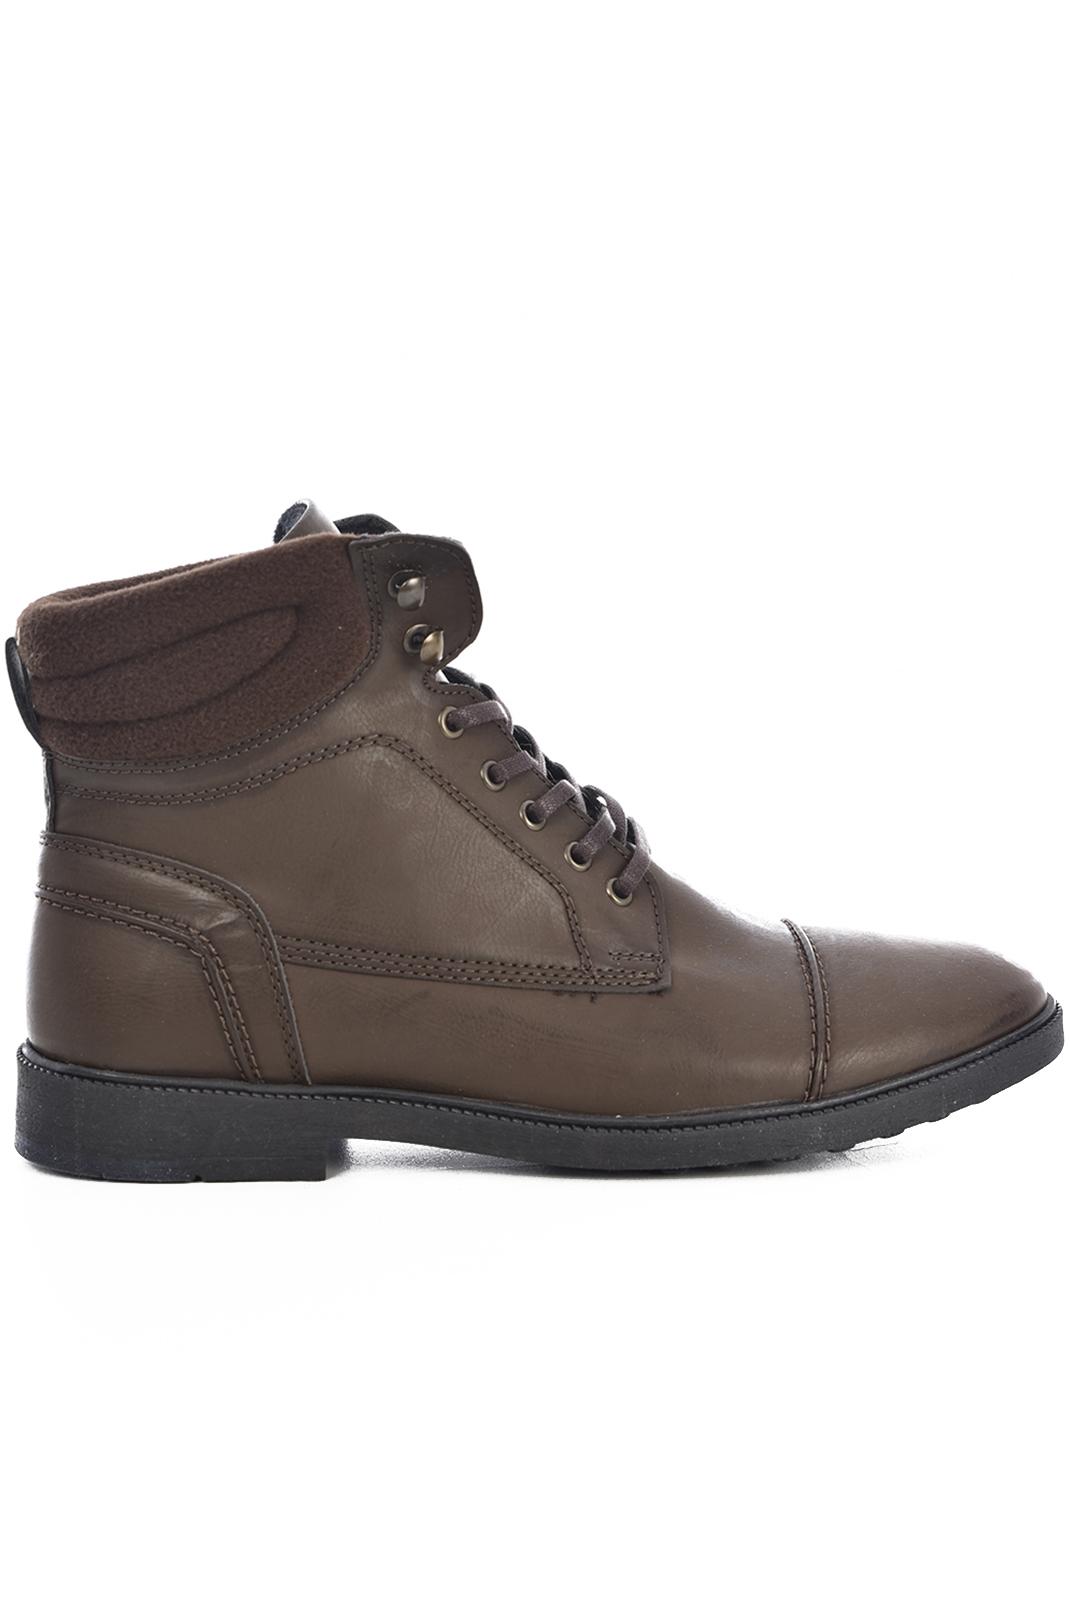 Chaussures de ville  Galax 281 CAFE